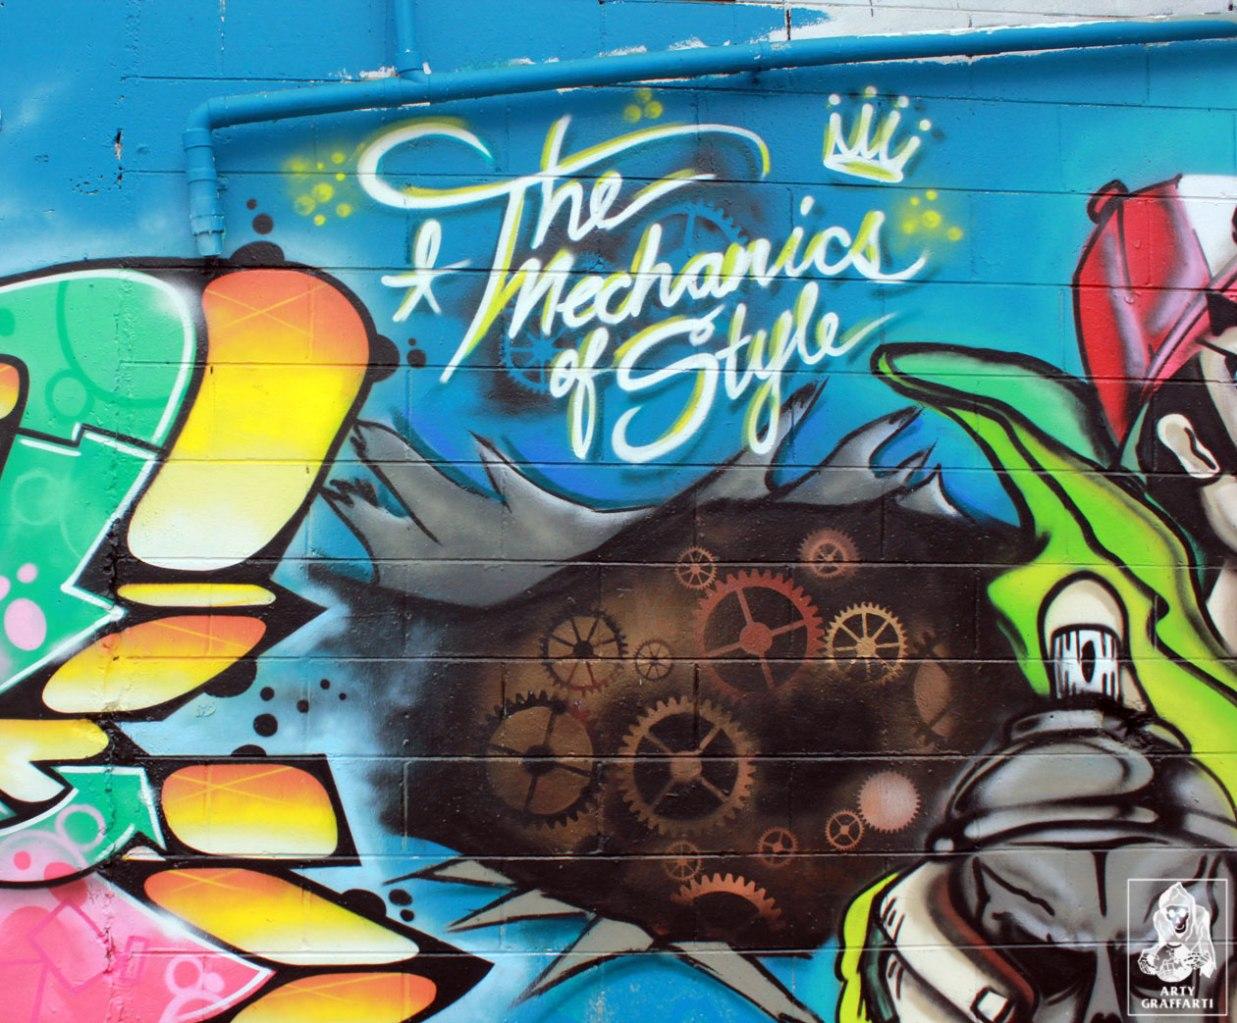 Paris-Naste-Preston-Melbourne-Graffiti-Arty-Graffarti6